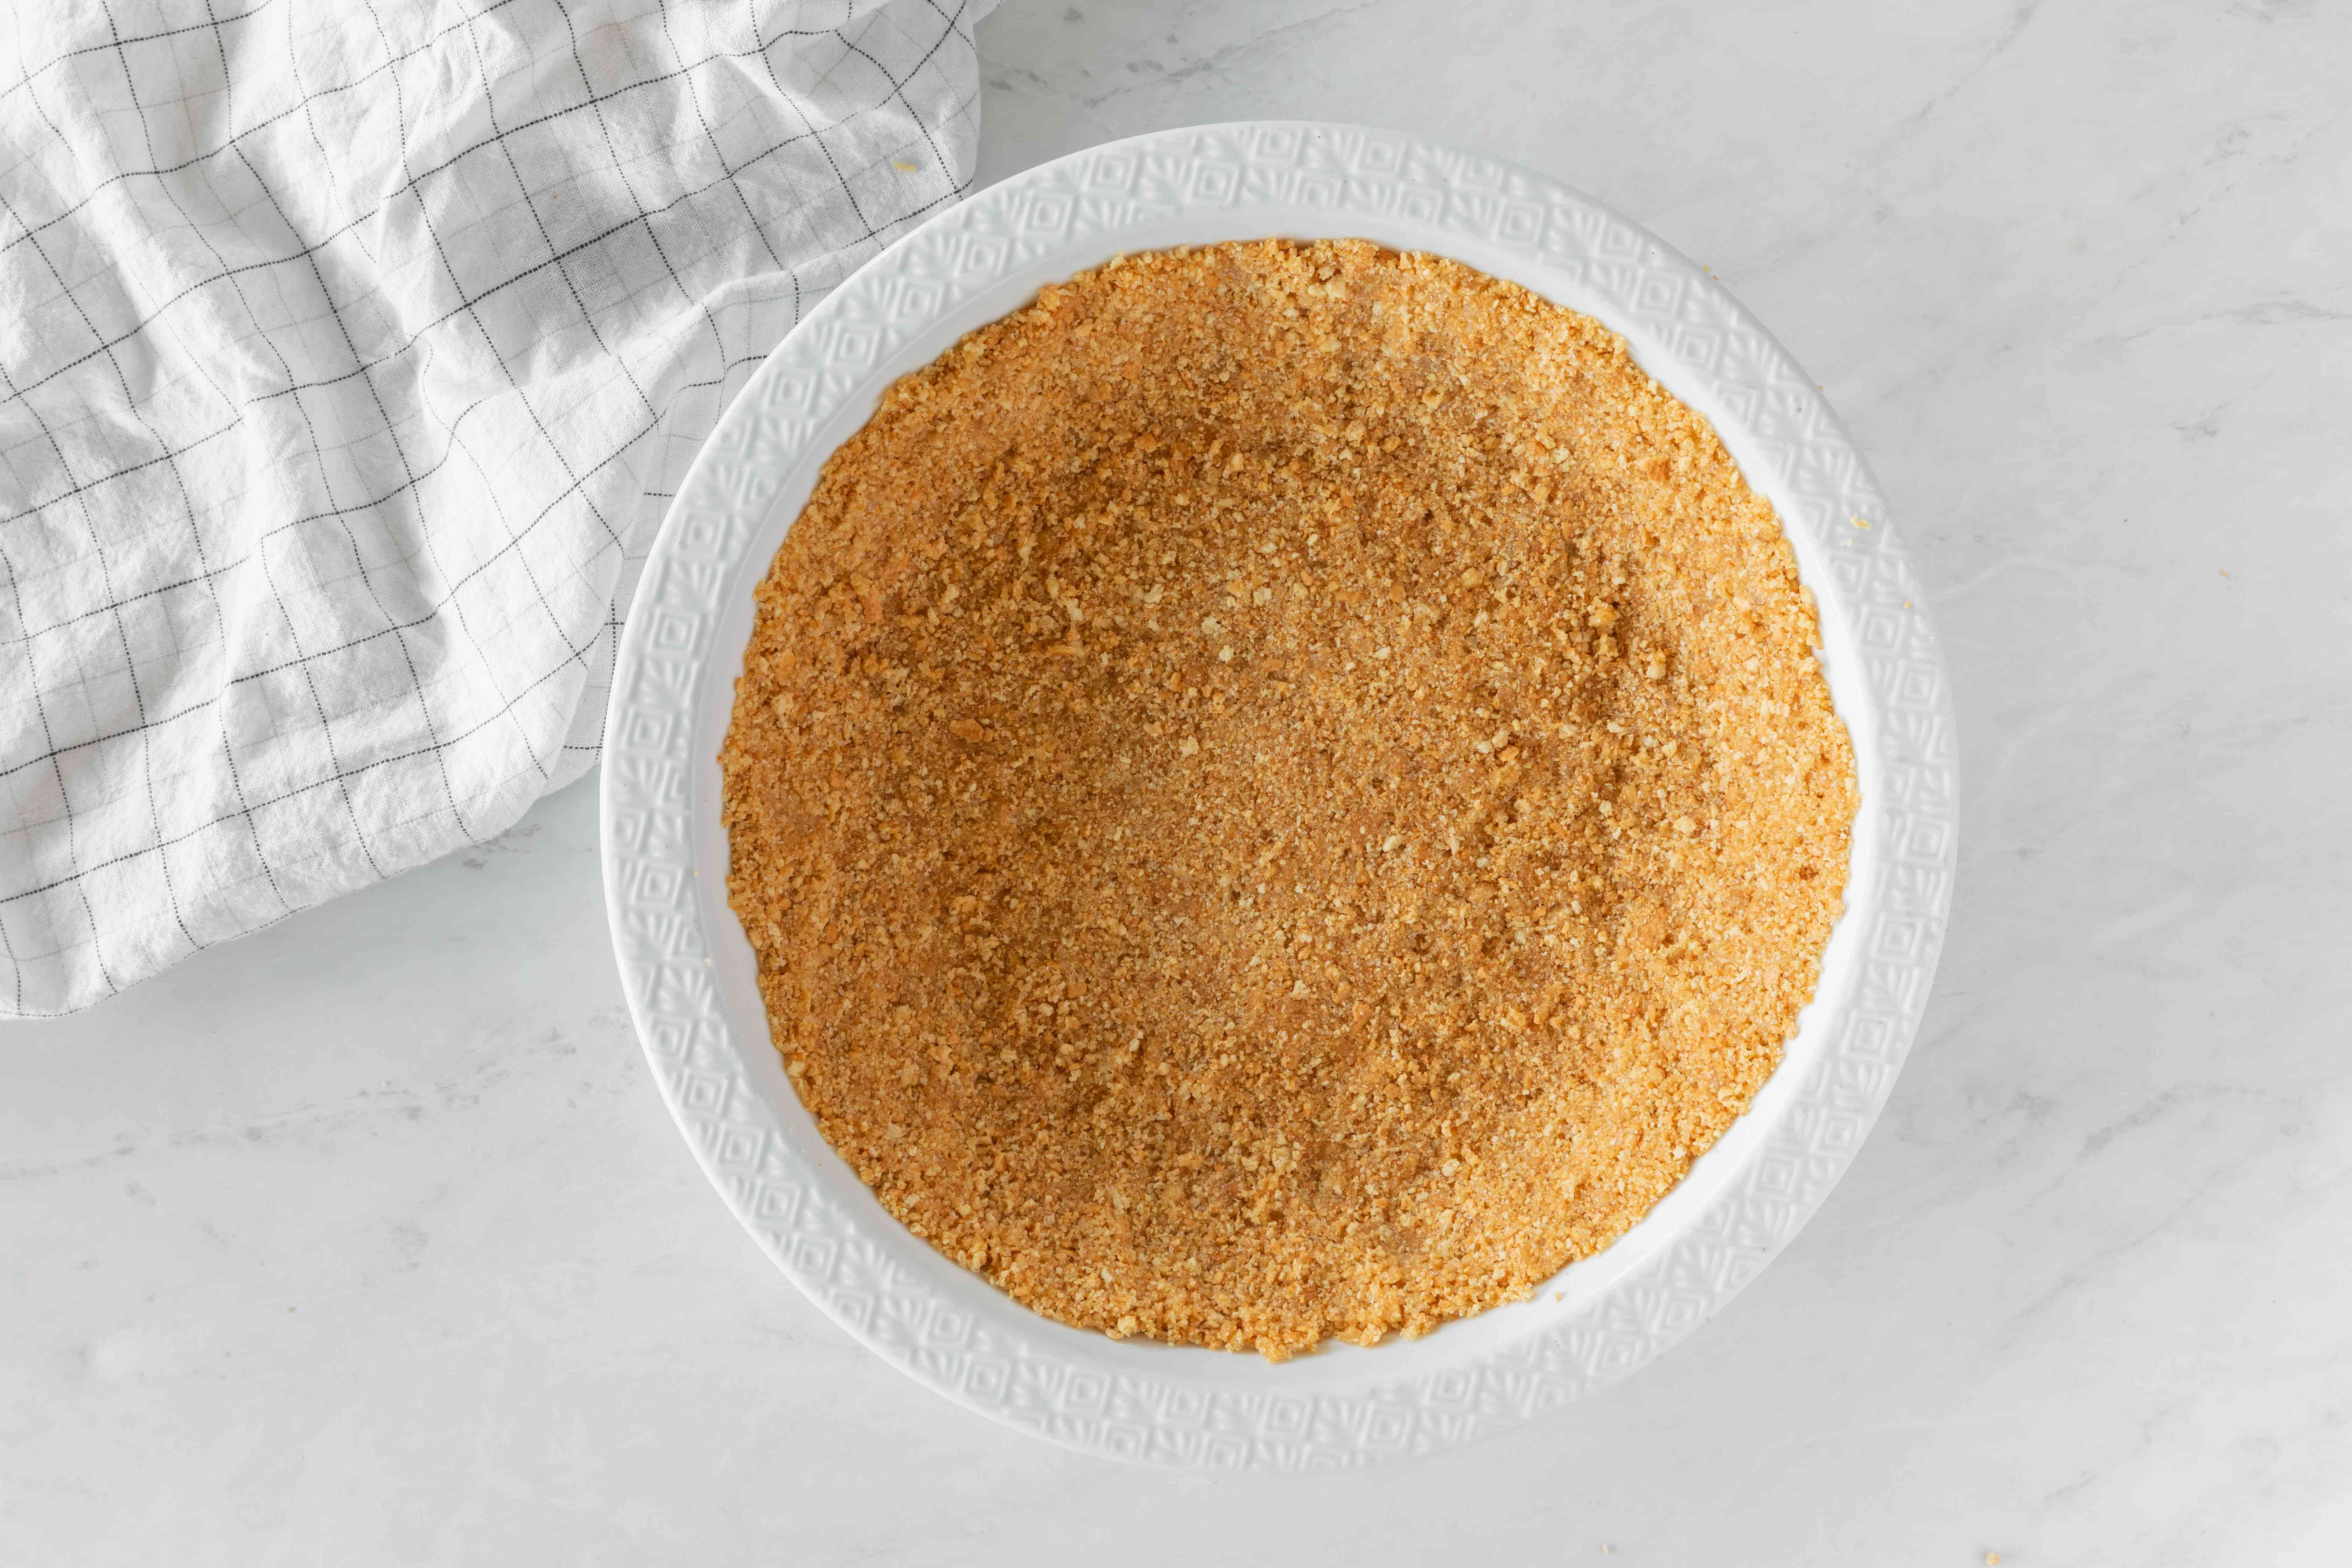 Pre-bake crust